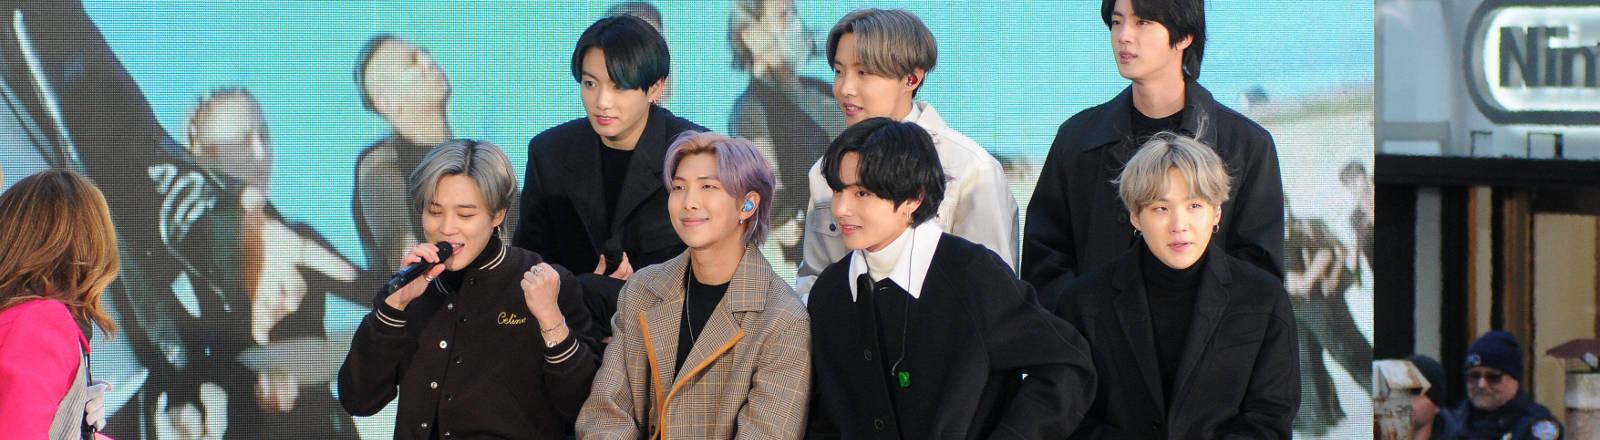 Die K-Pop-Band BTS